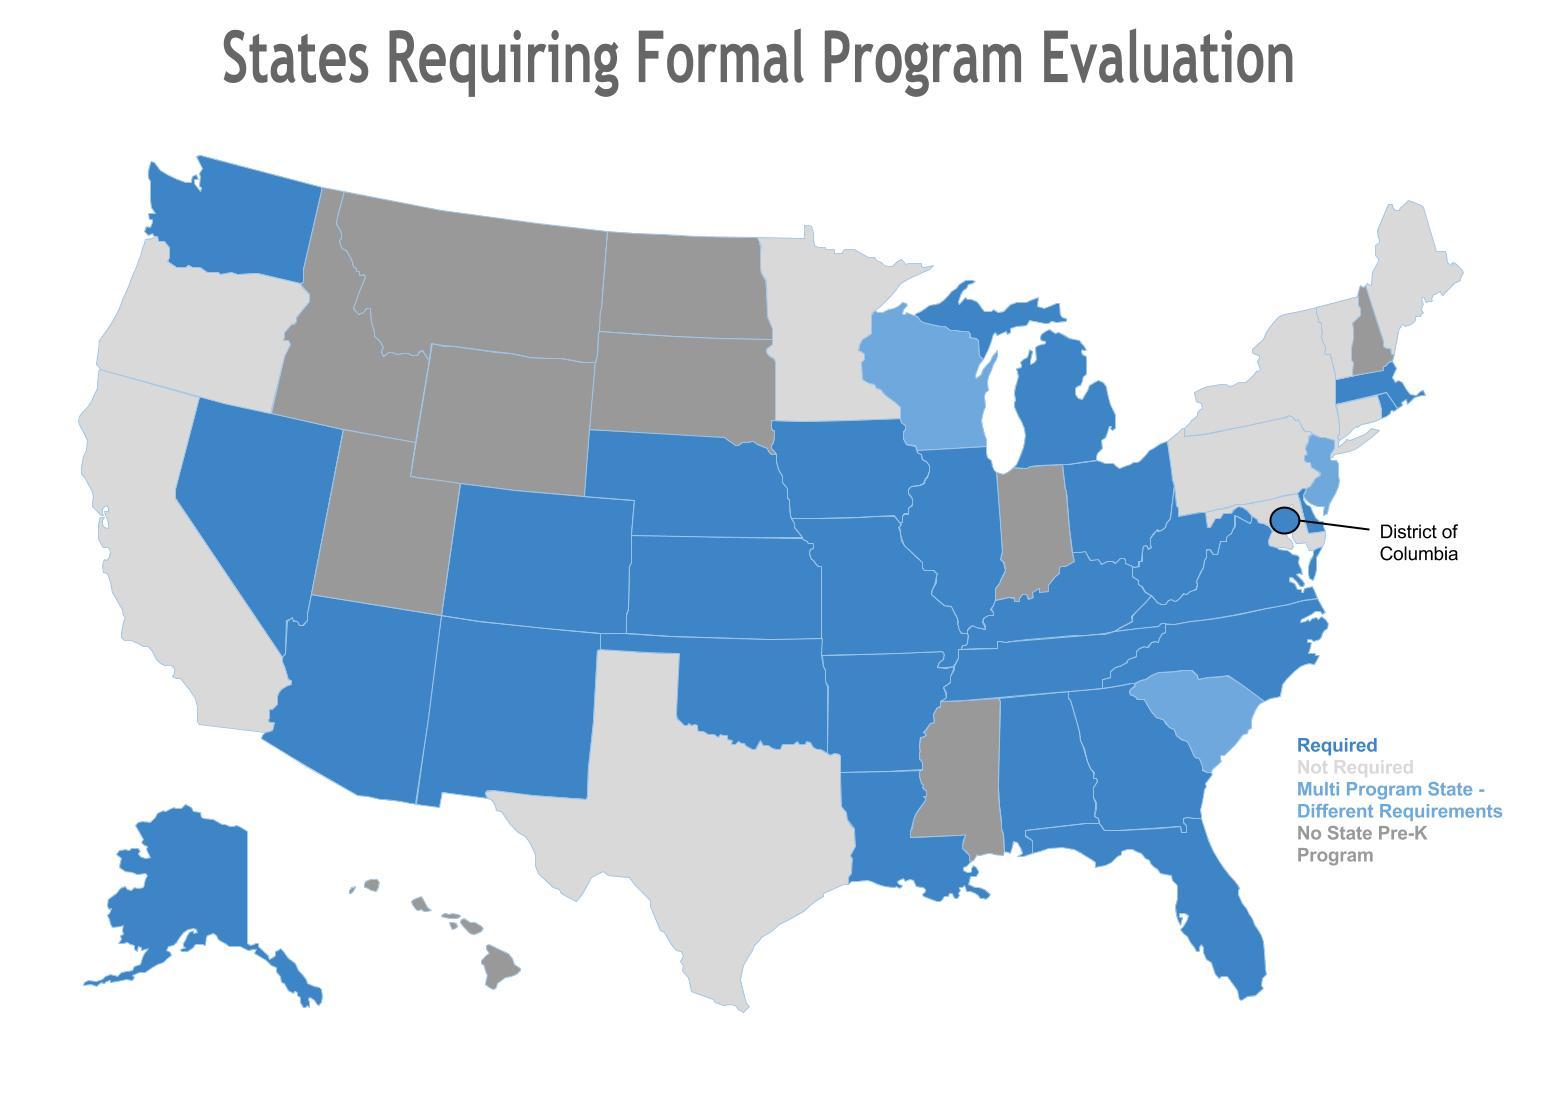 States Requiring Formal Program Evaluation